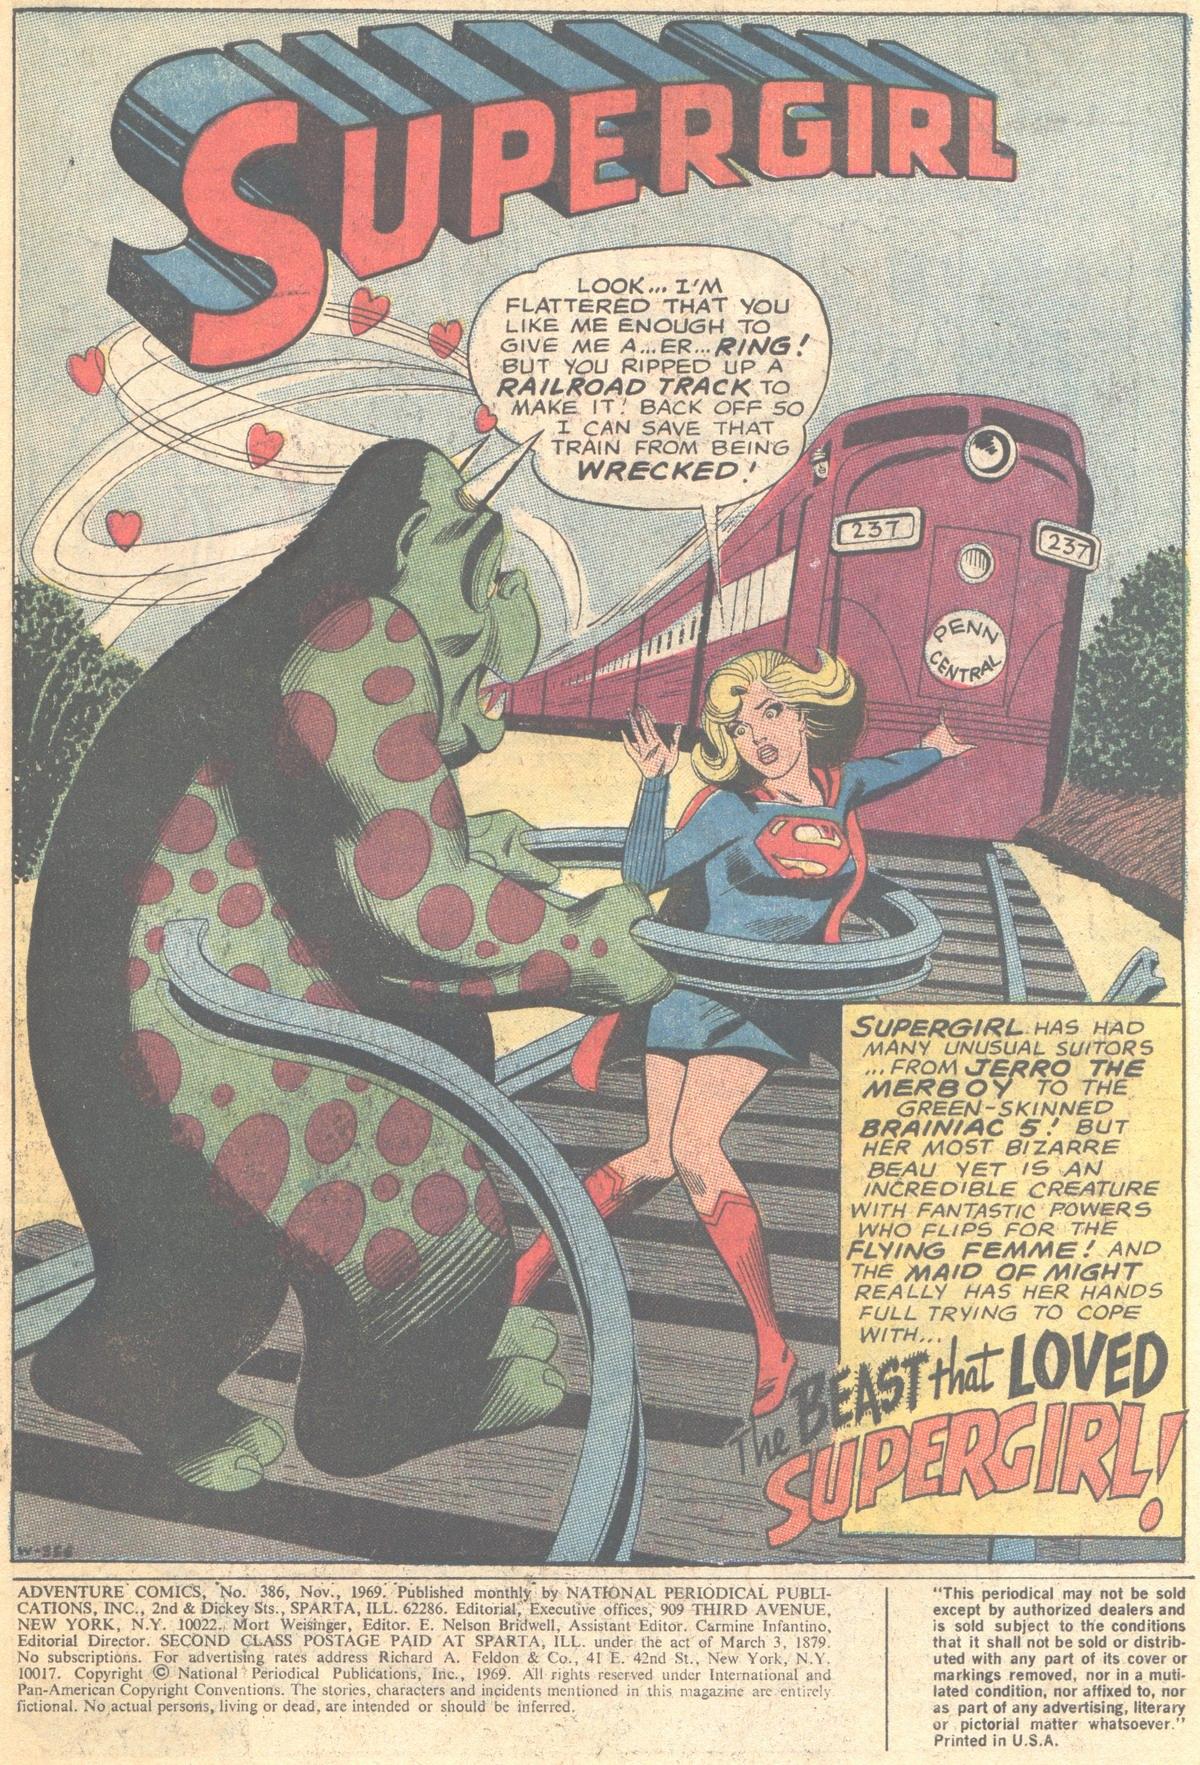 Read online Adventure Comics (1938) comic -  Issue #386 - 3